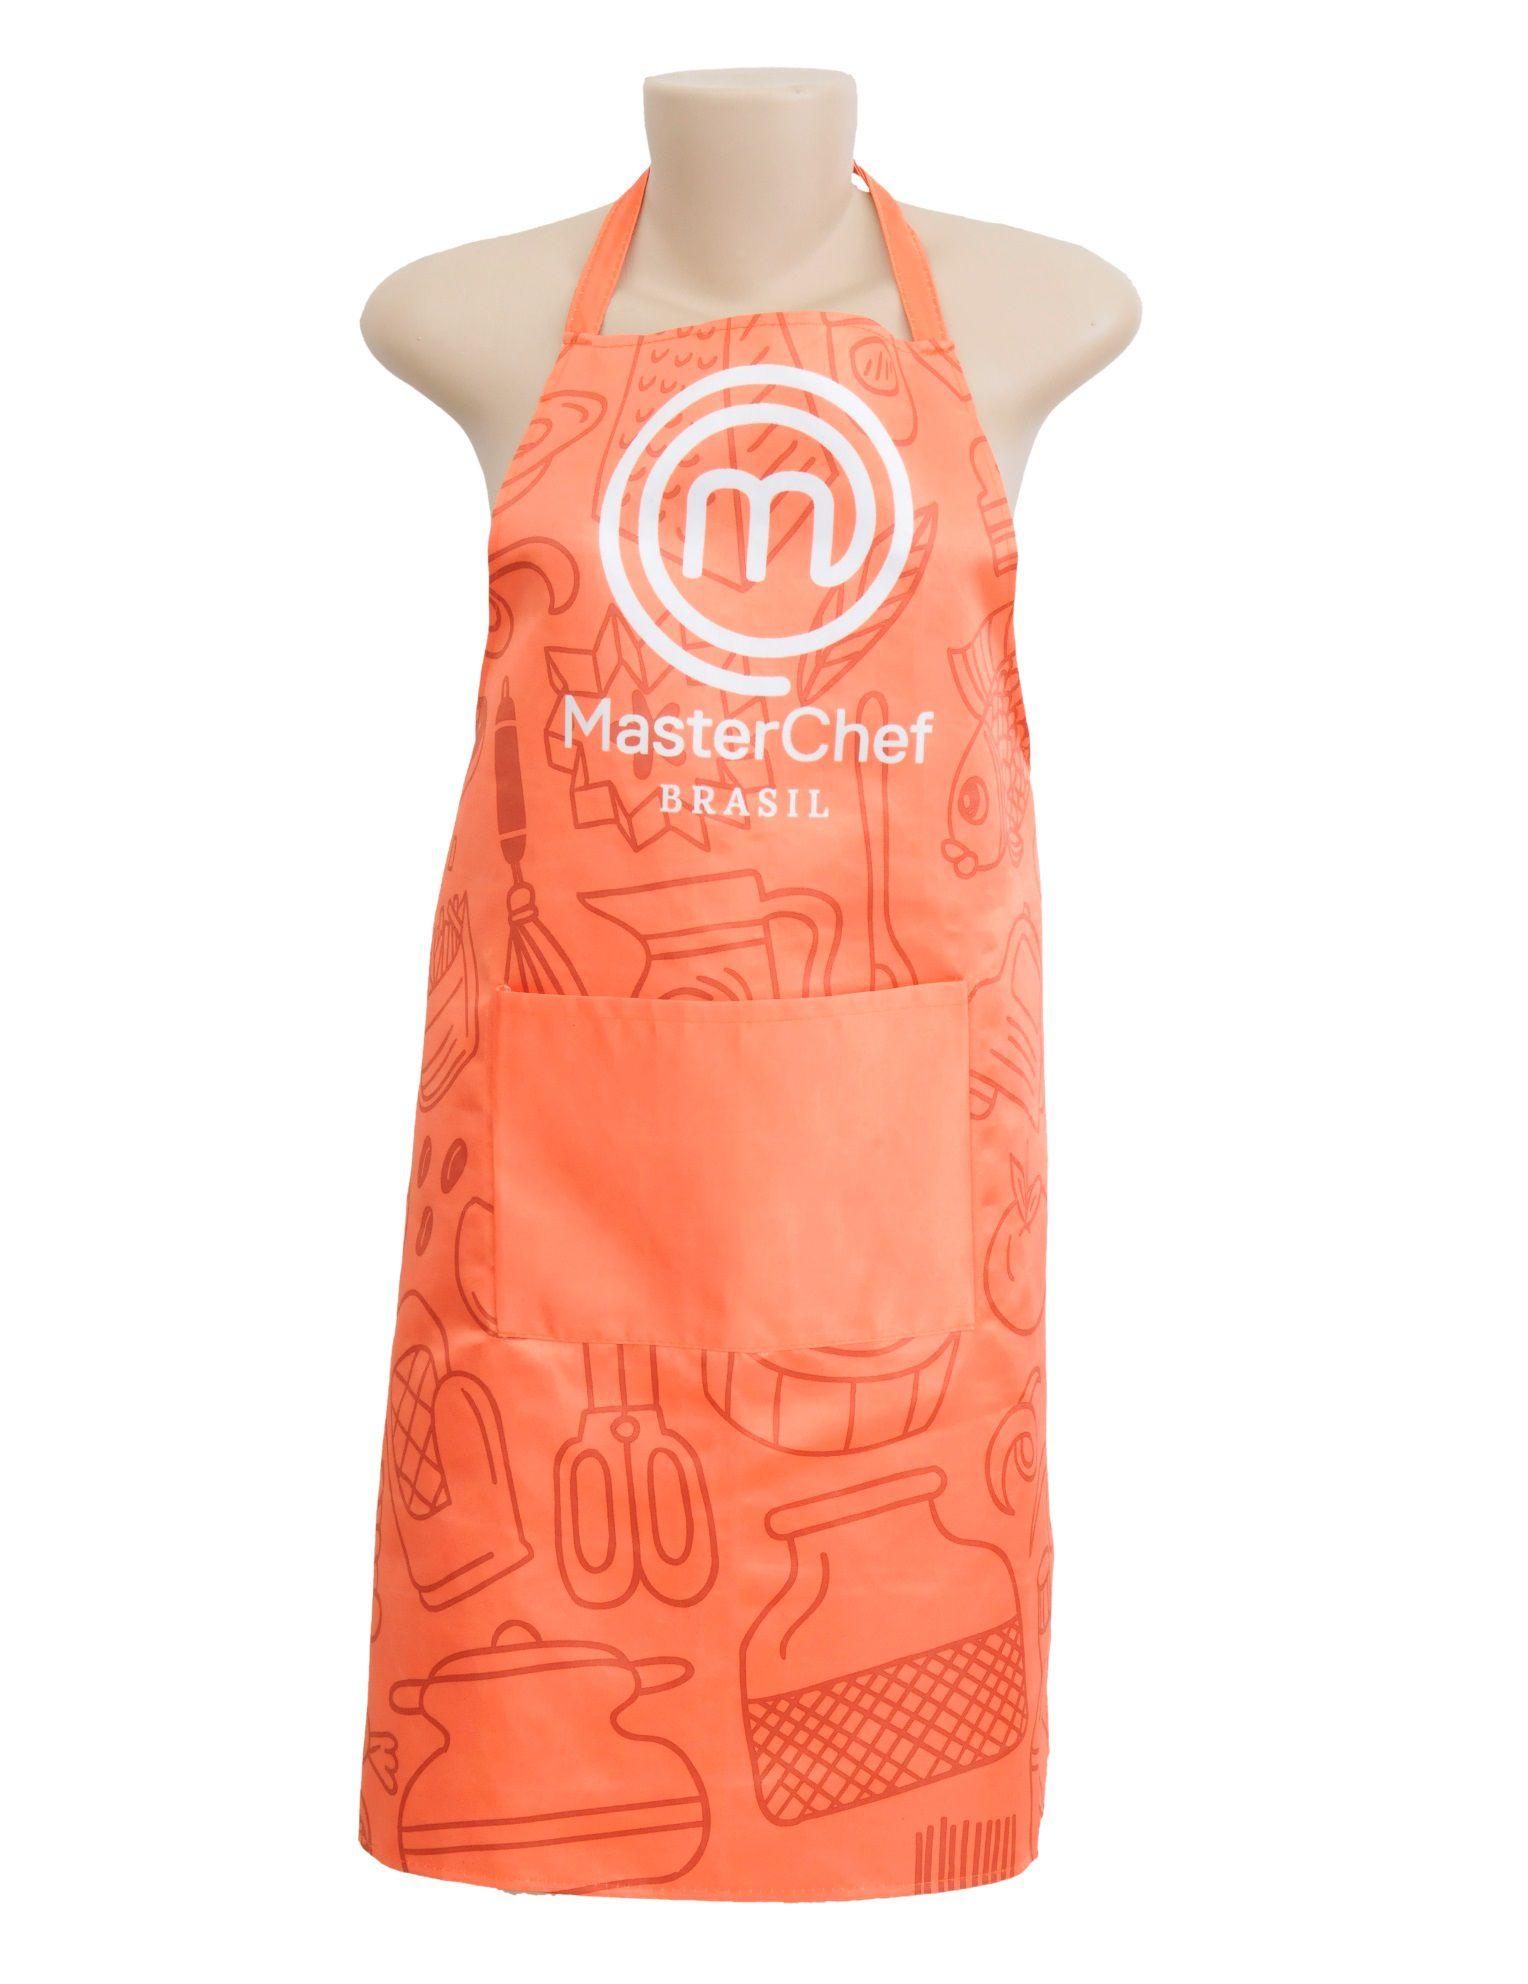 Avental de Cozinha MasterChef Laranja